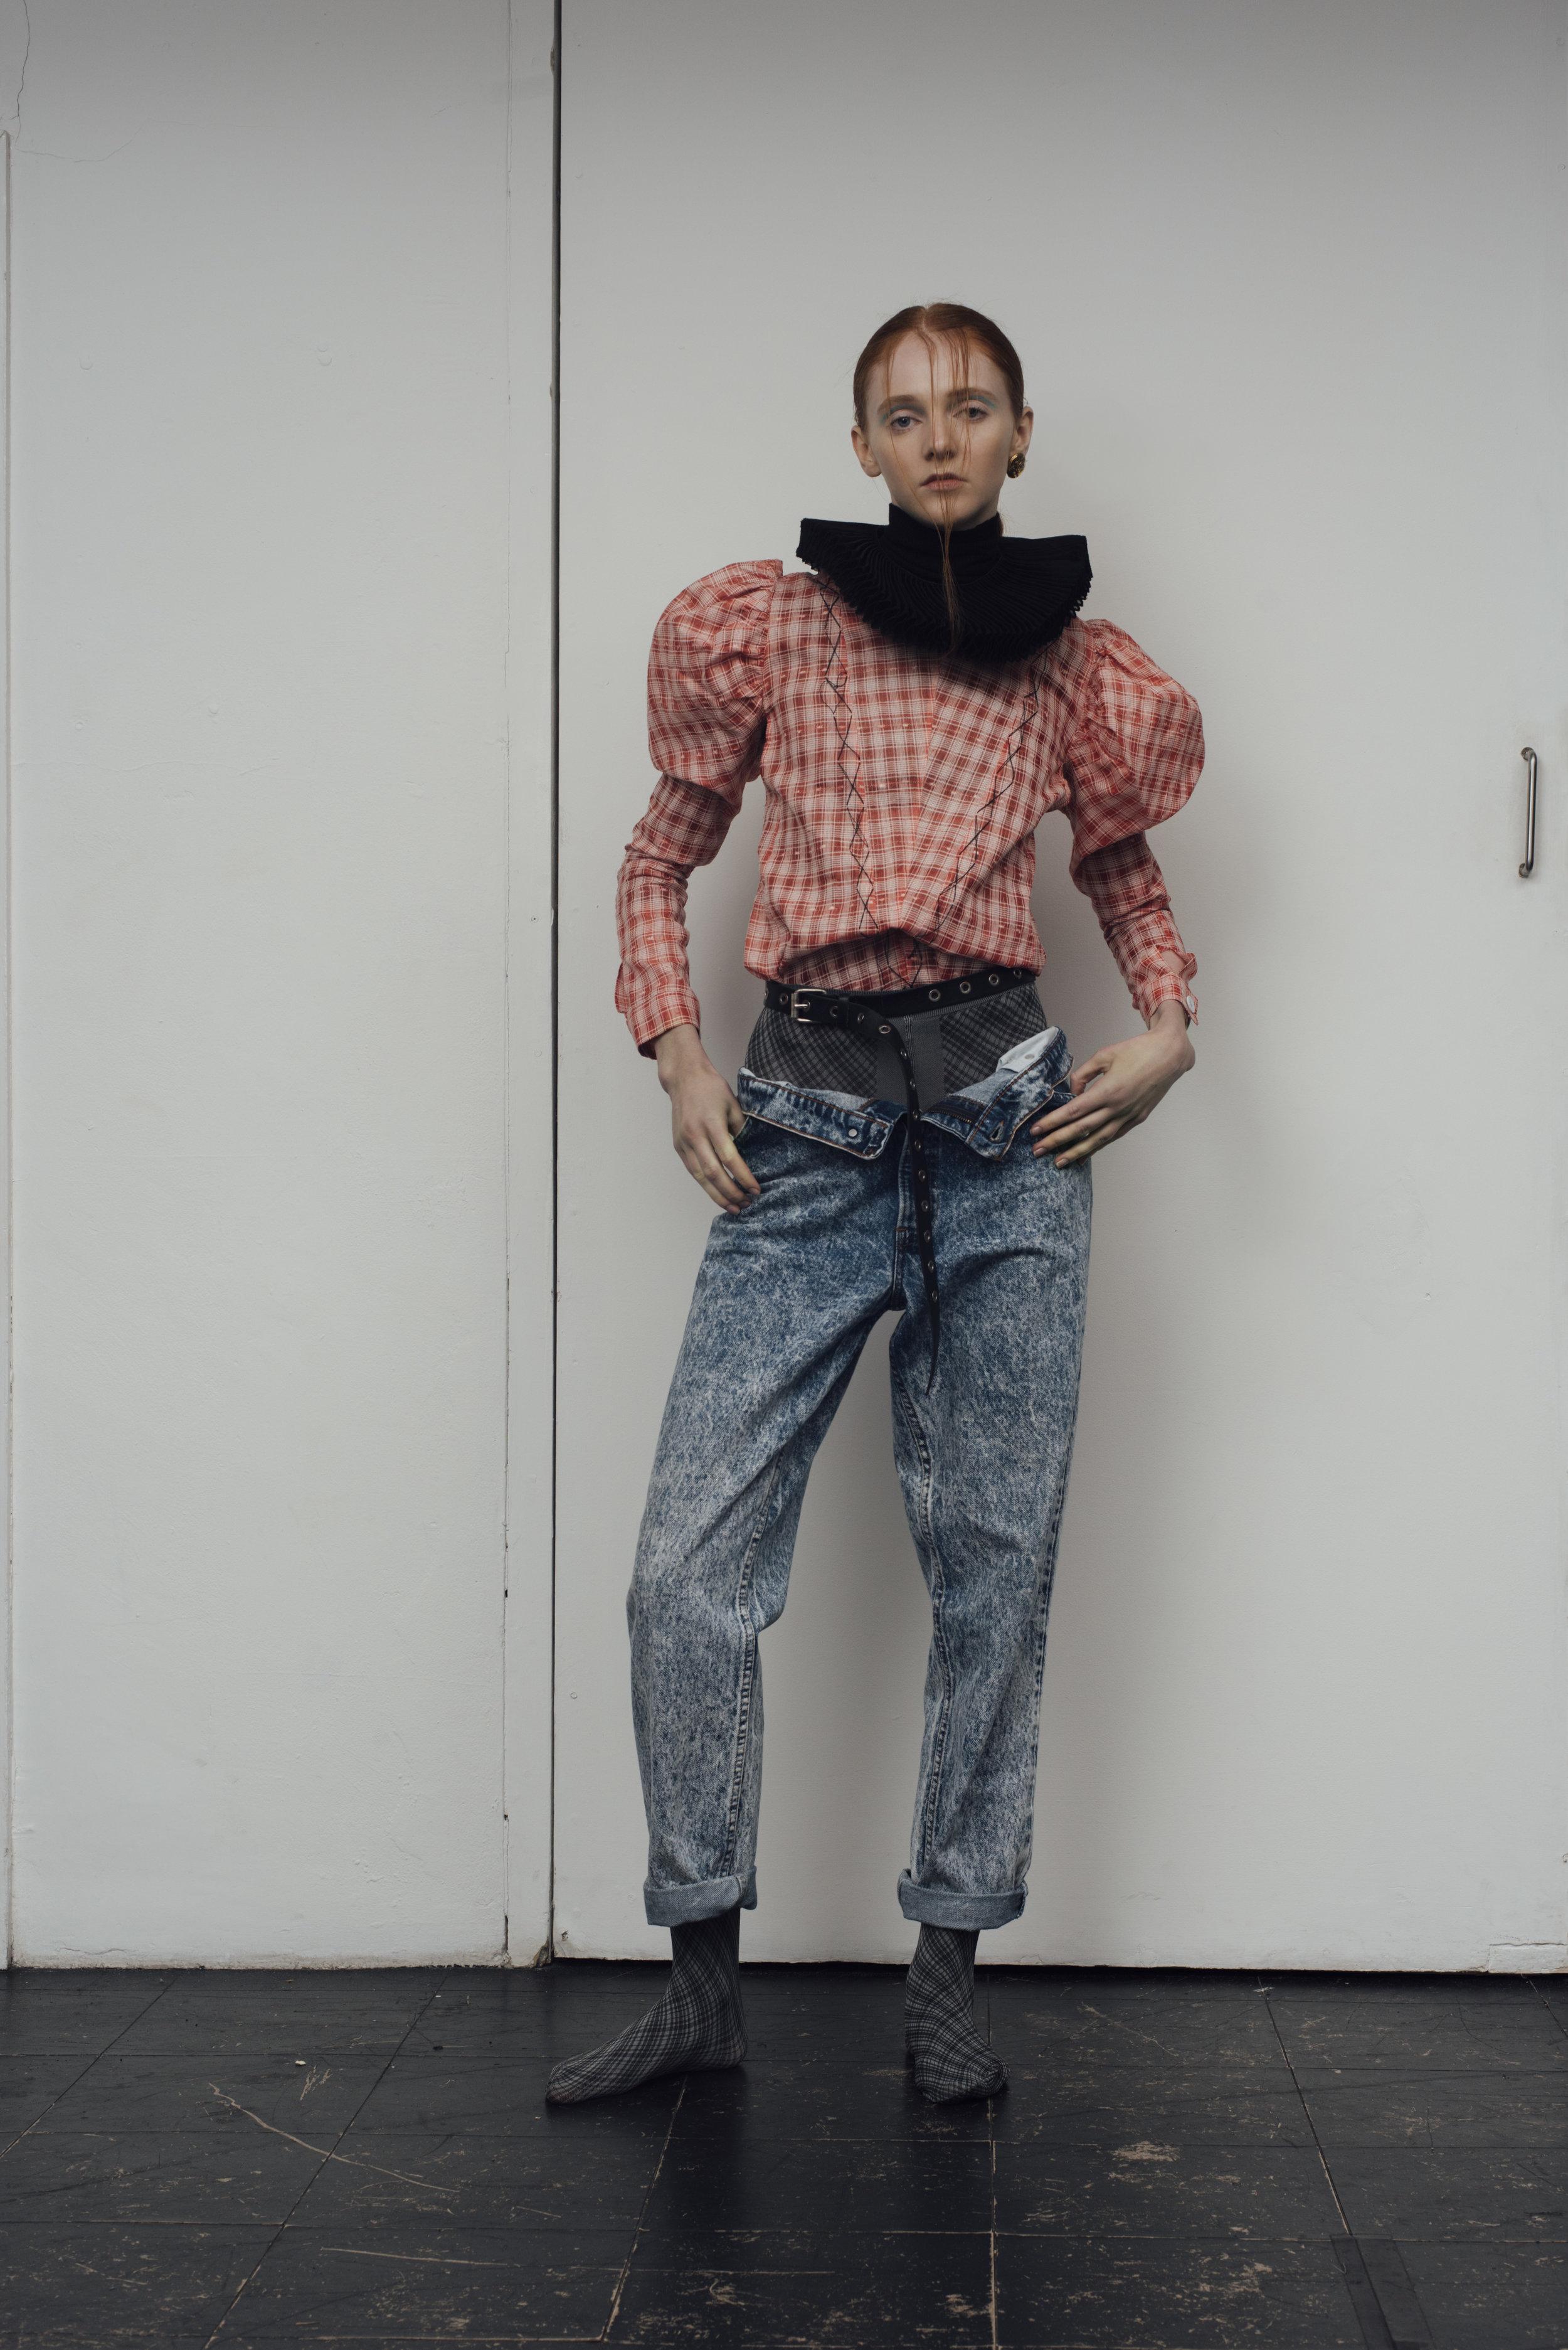 blouse  CONSTANCE BLACKALLER , collar COSTUME STUDIO, levi jeans  MINT VINTAGE , earrings STYLIST'S OWN CHANEL VINTAGE